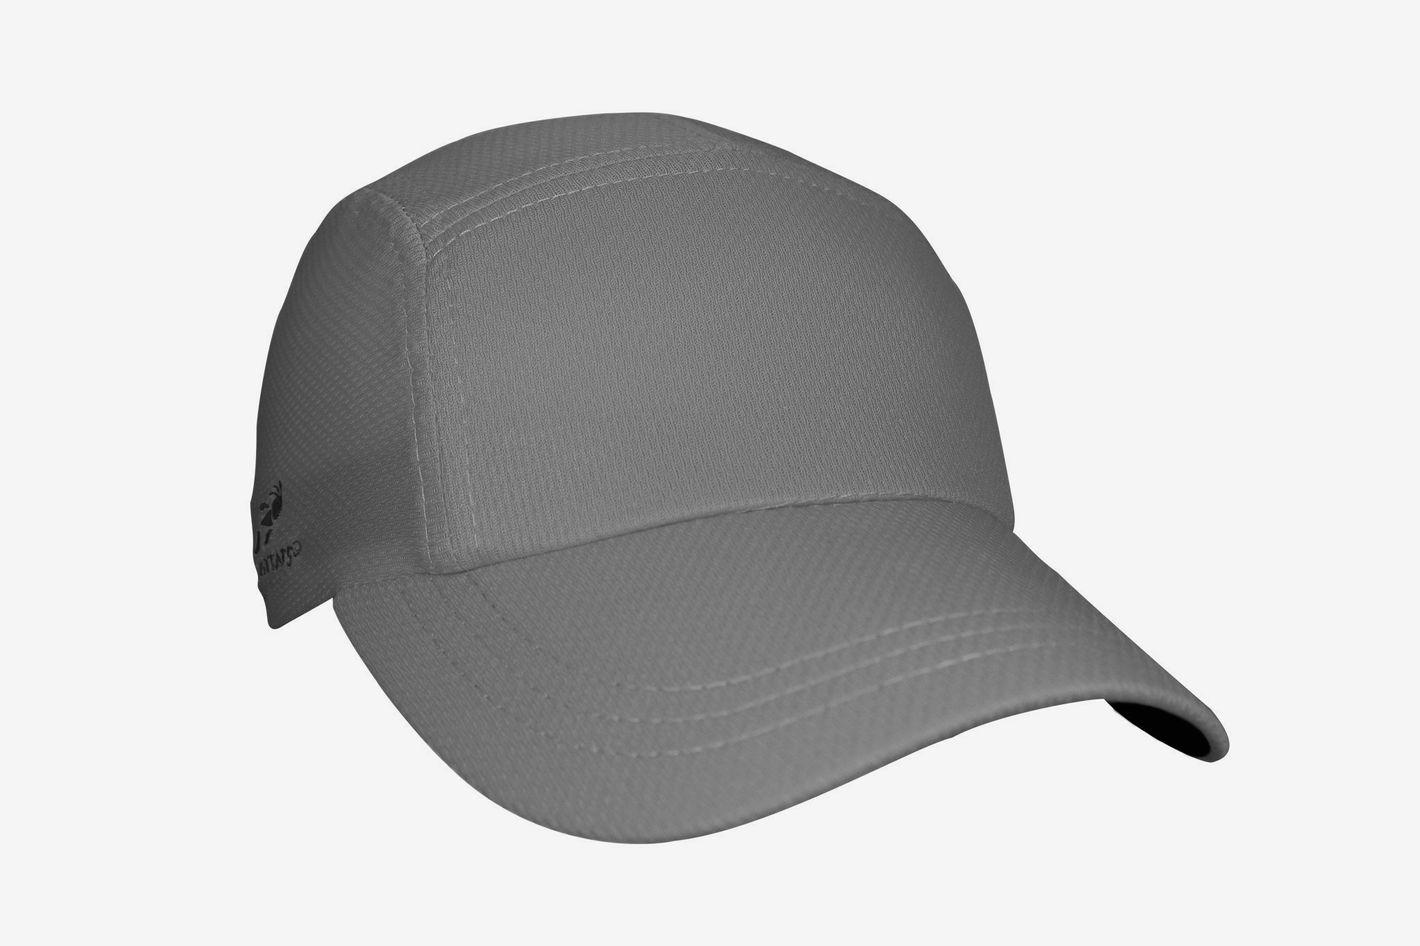 Headsweats Performance  Sports Hat